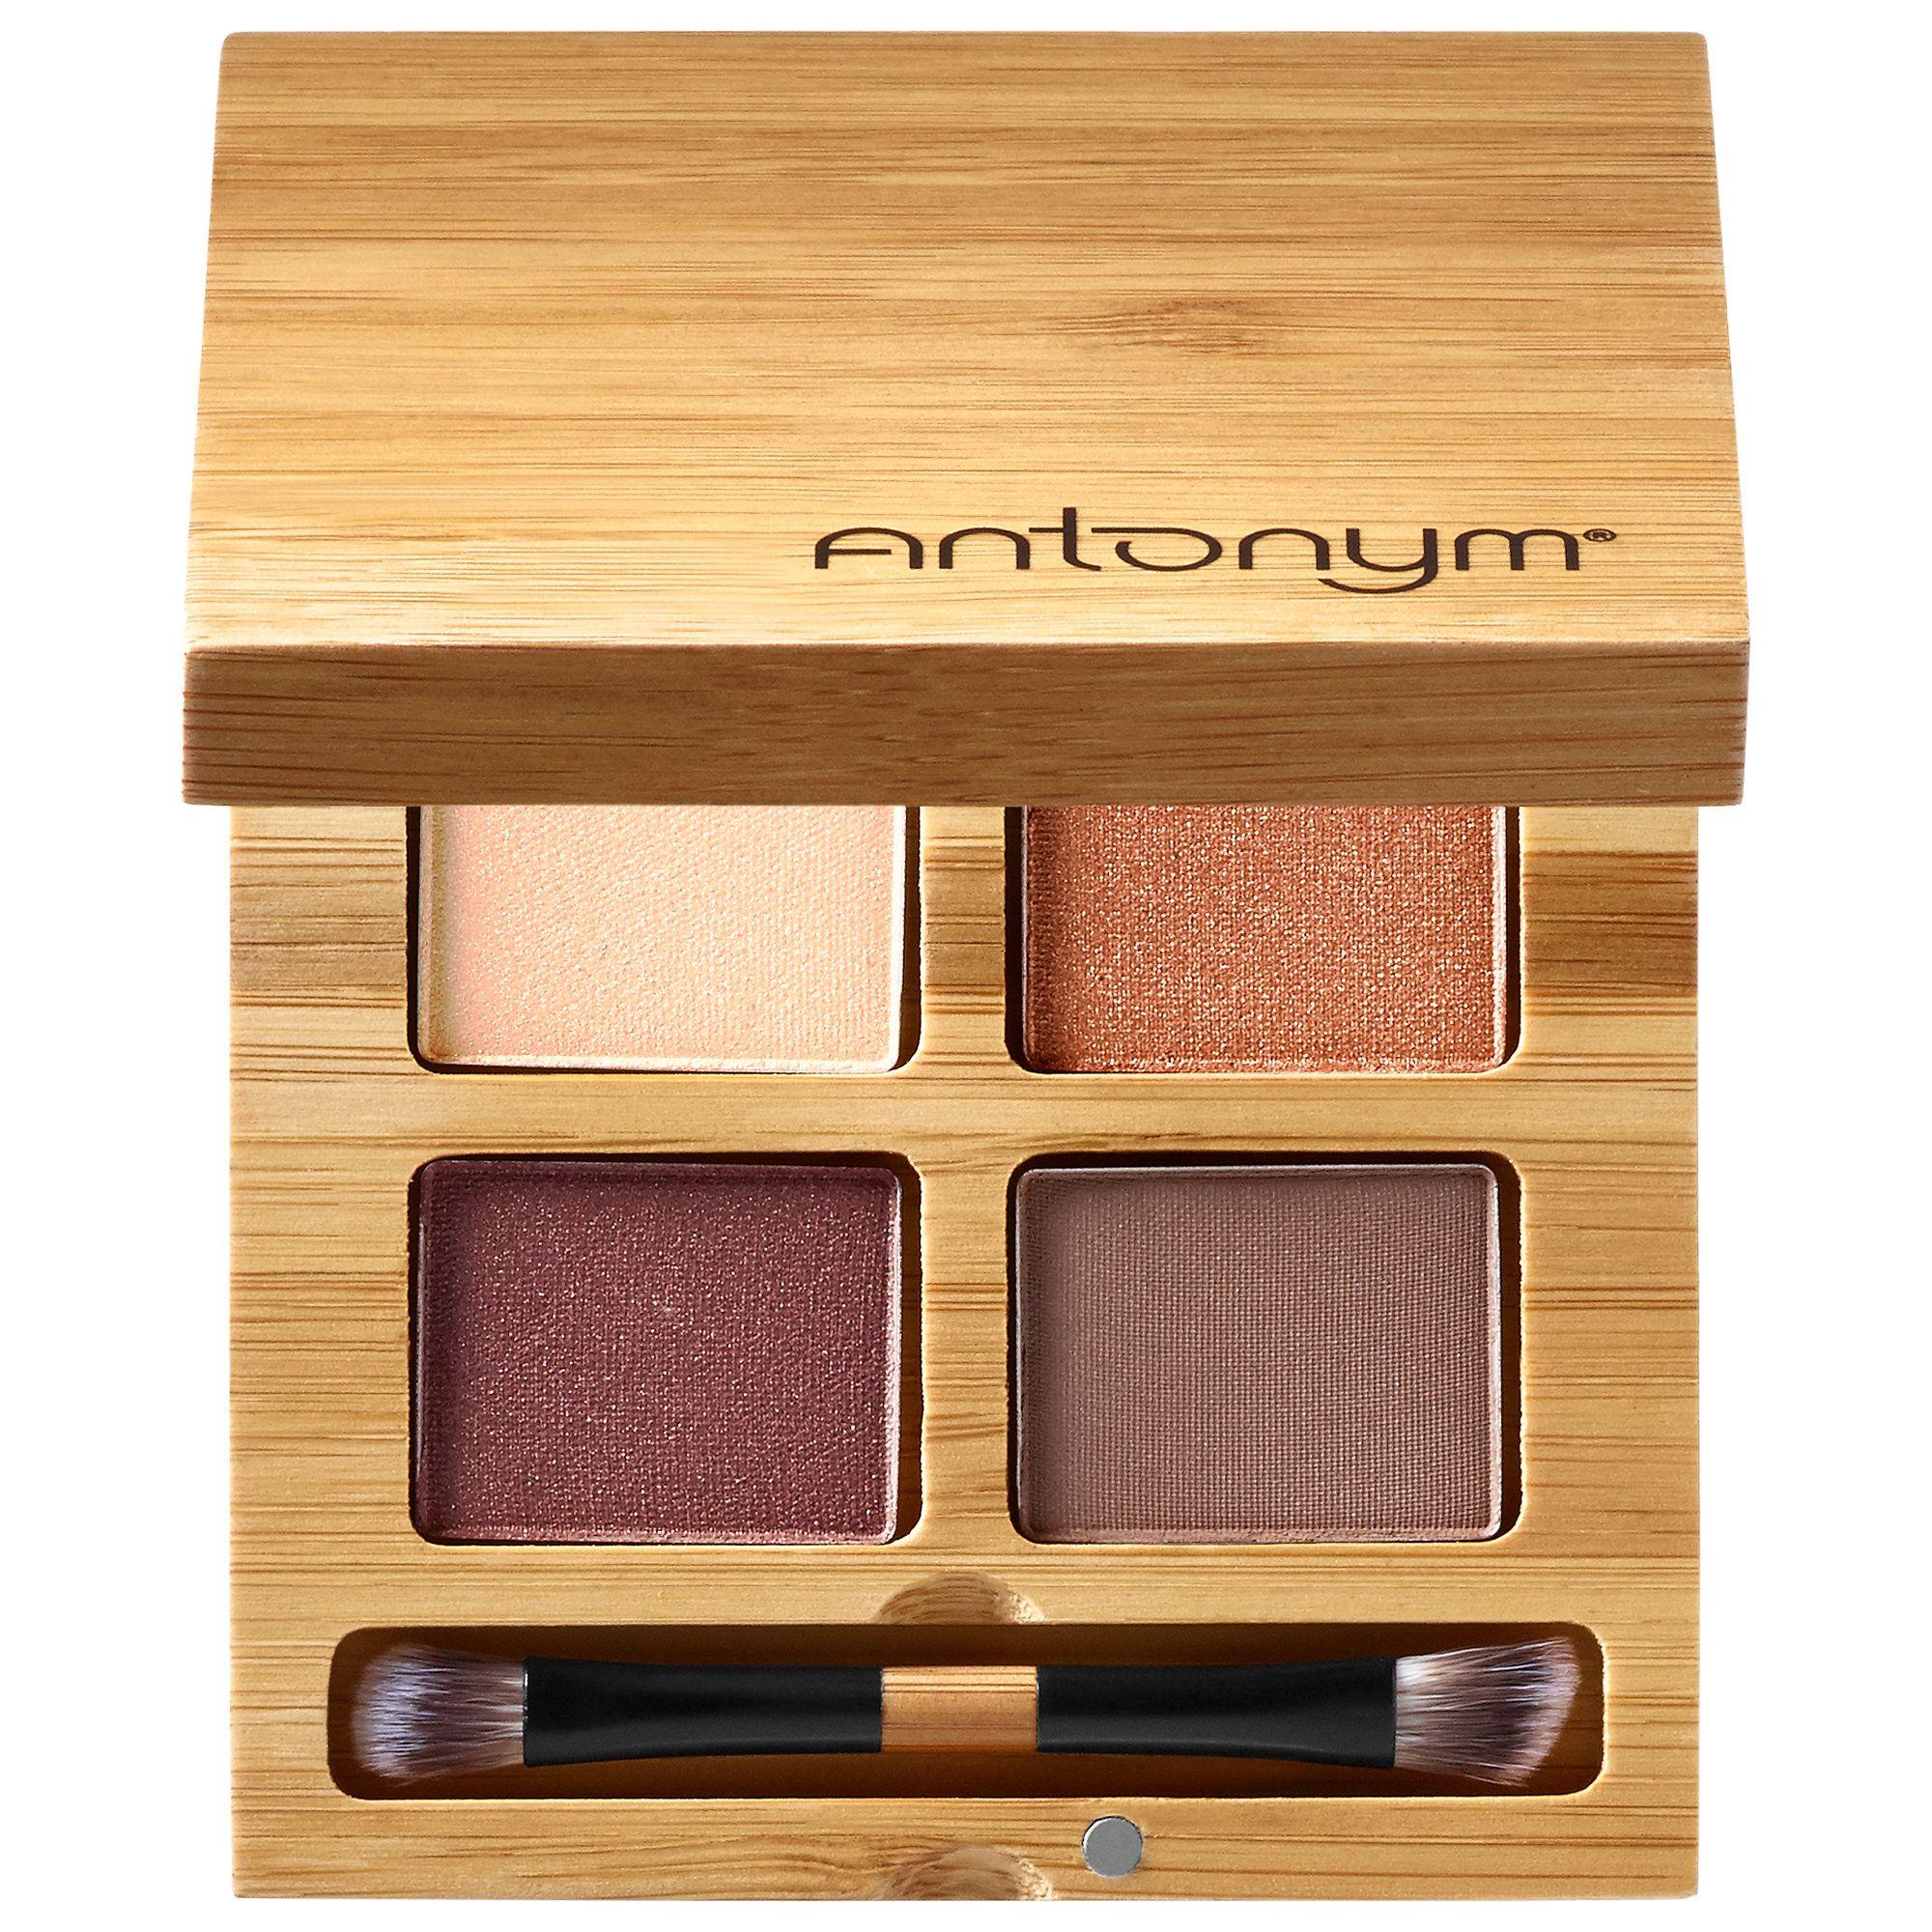 Shop Antonym's Certified Organic Eyeshadow Quattro at